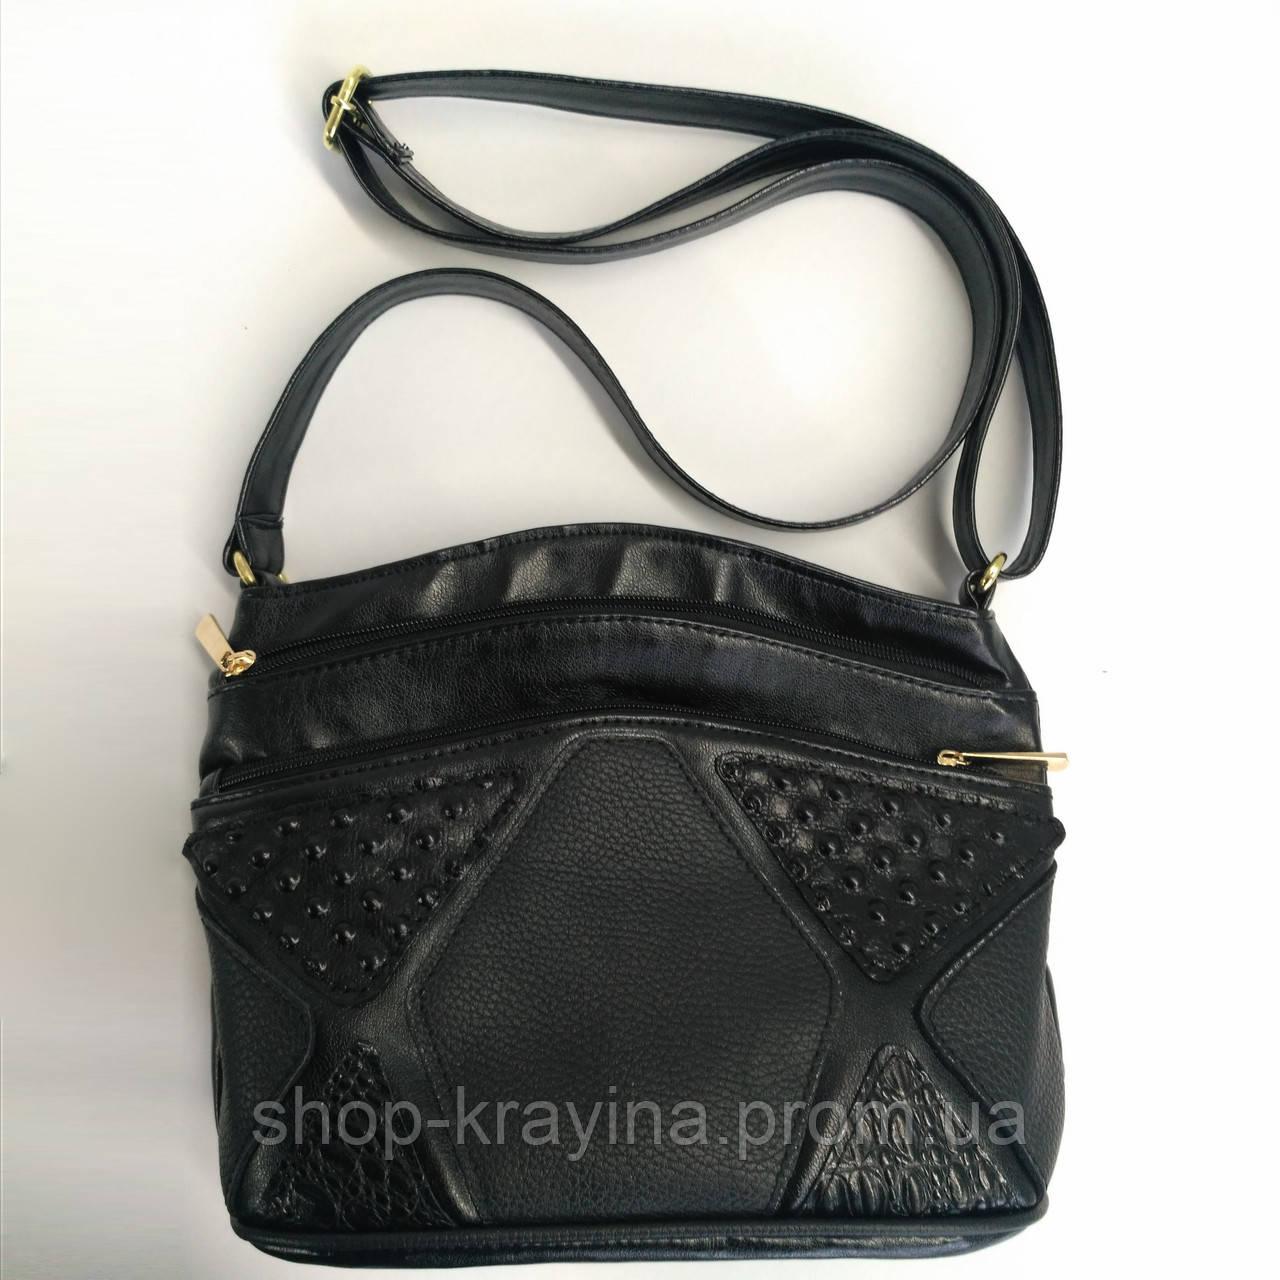 Cумка black elegance 27*22*11 см